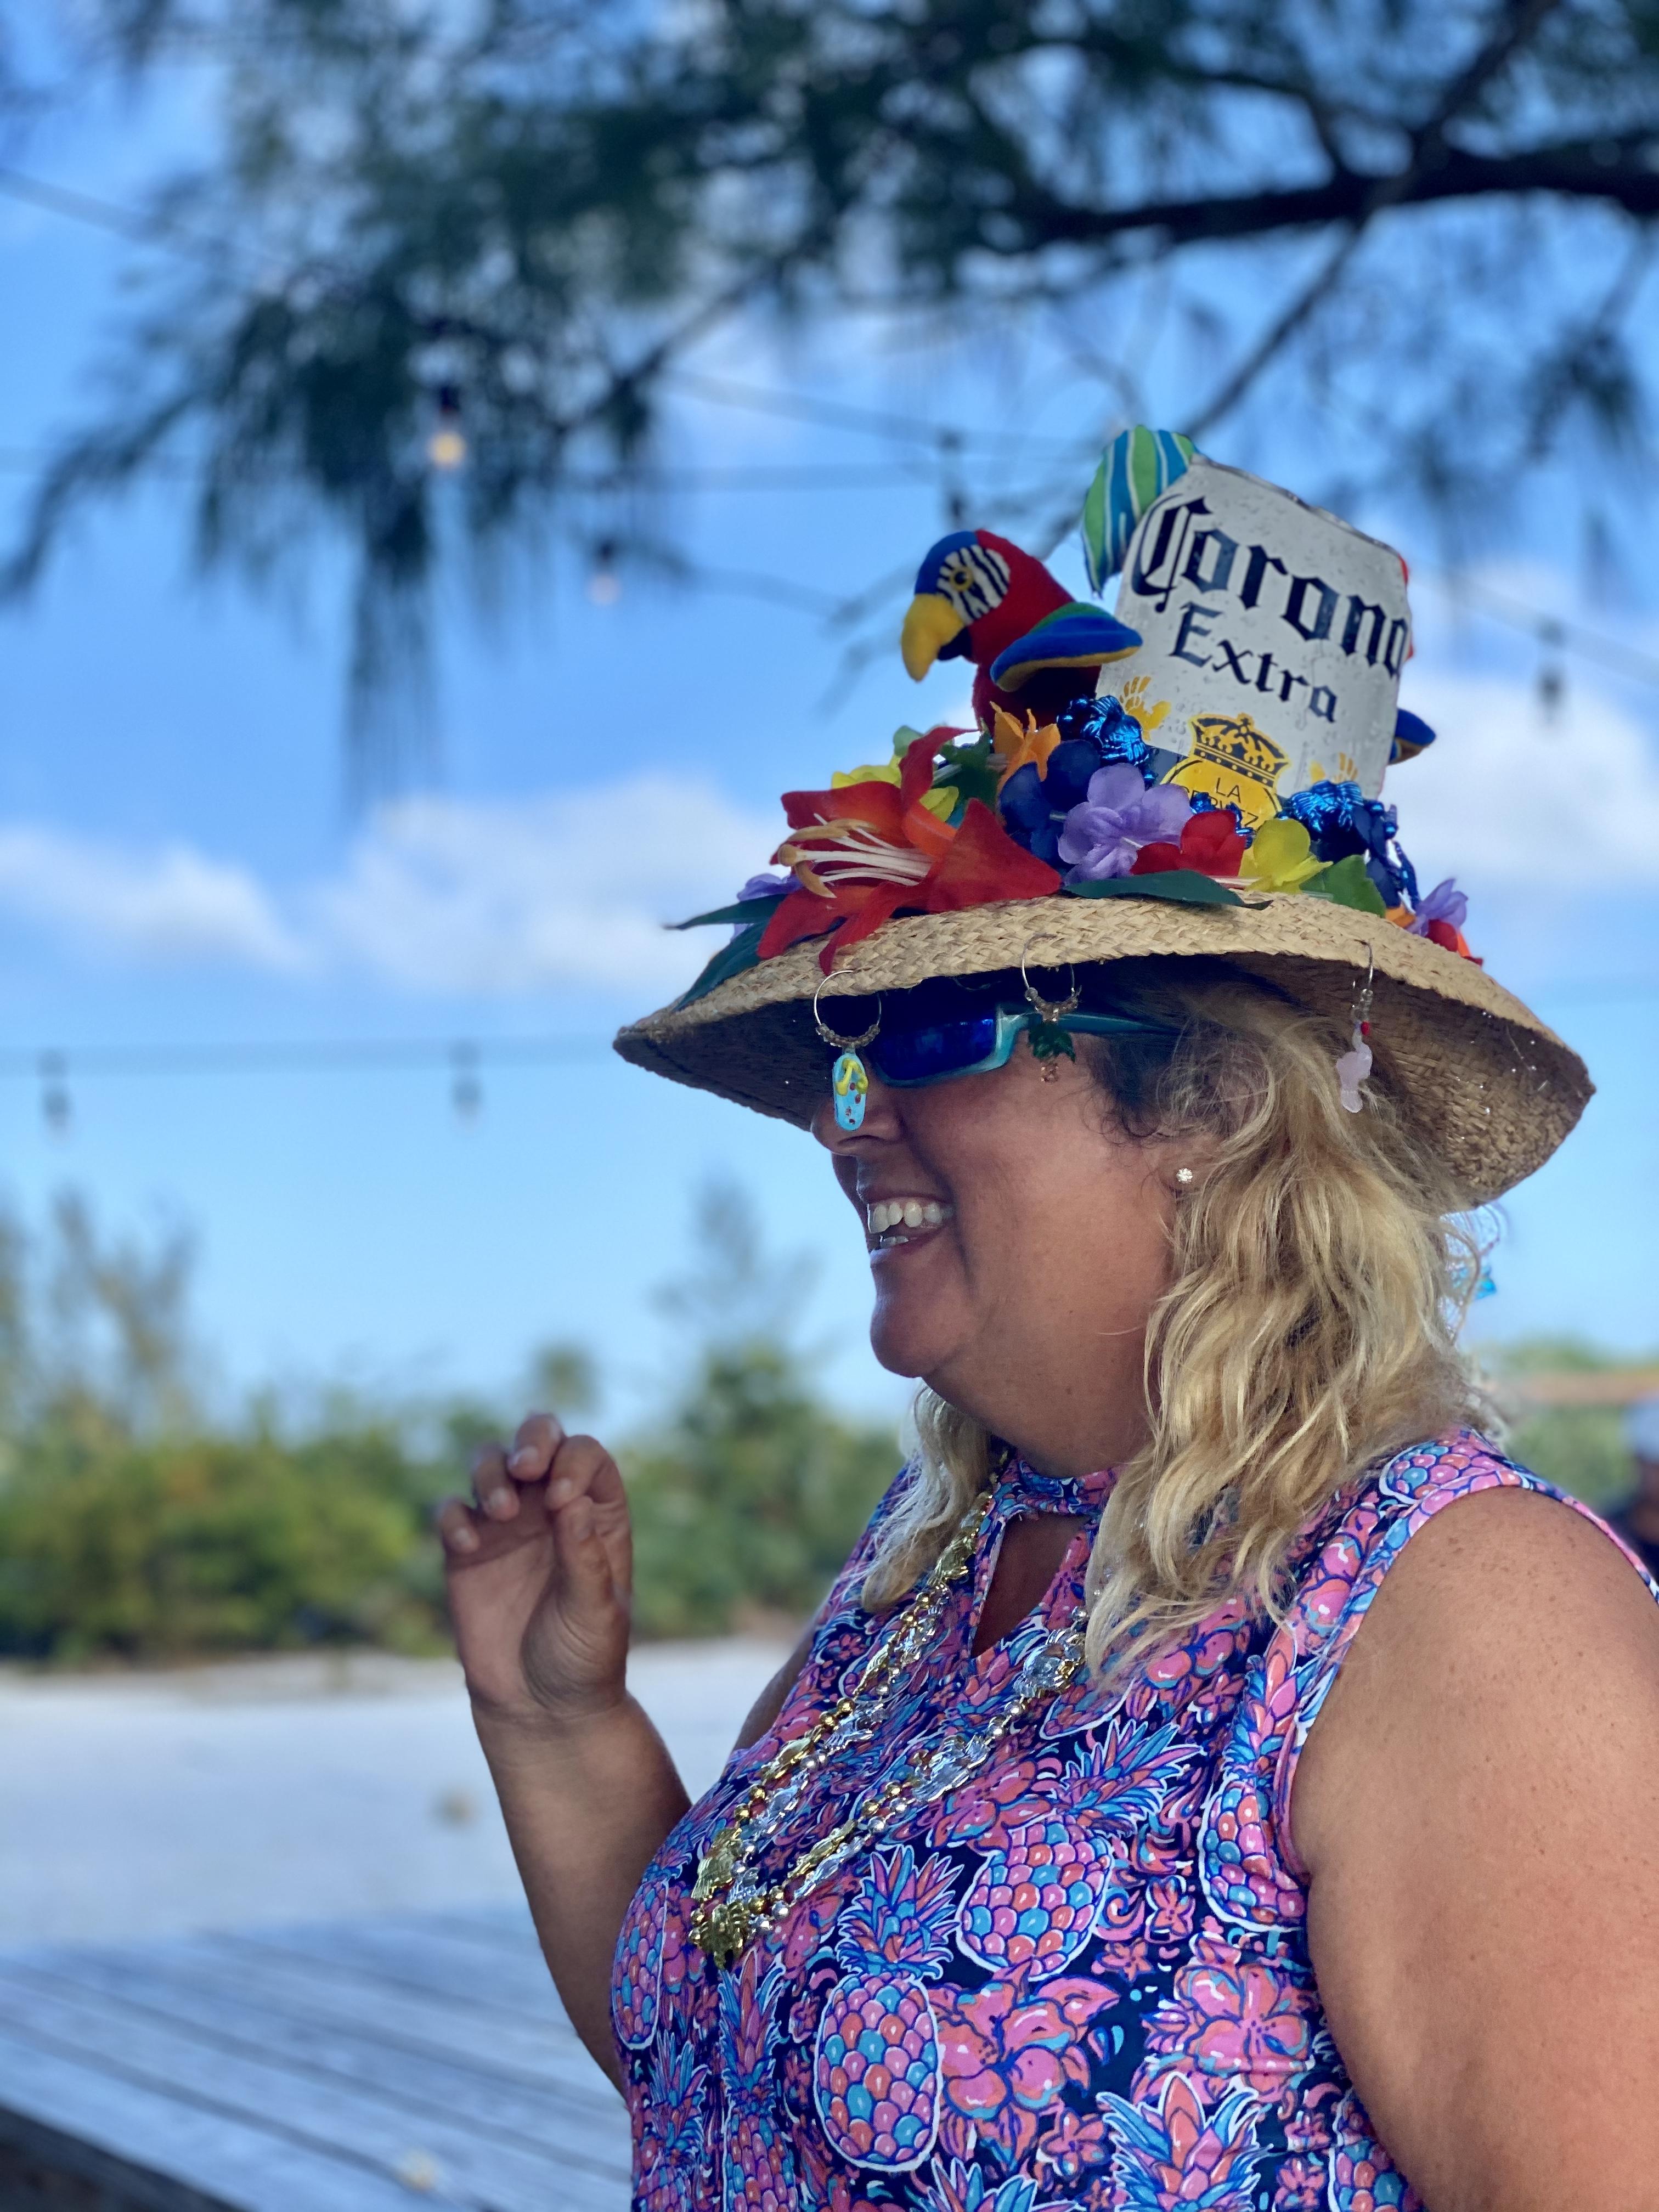 Ms. Andrea's winning hat